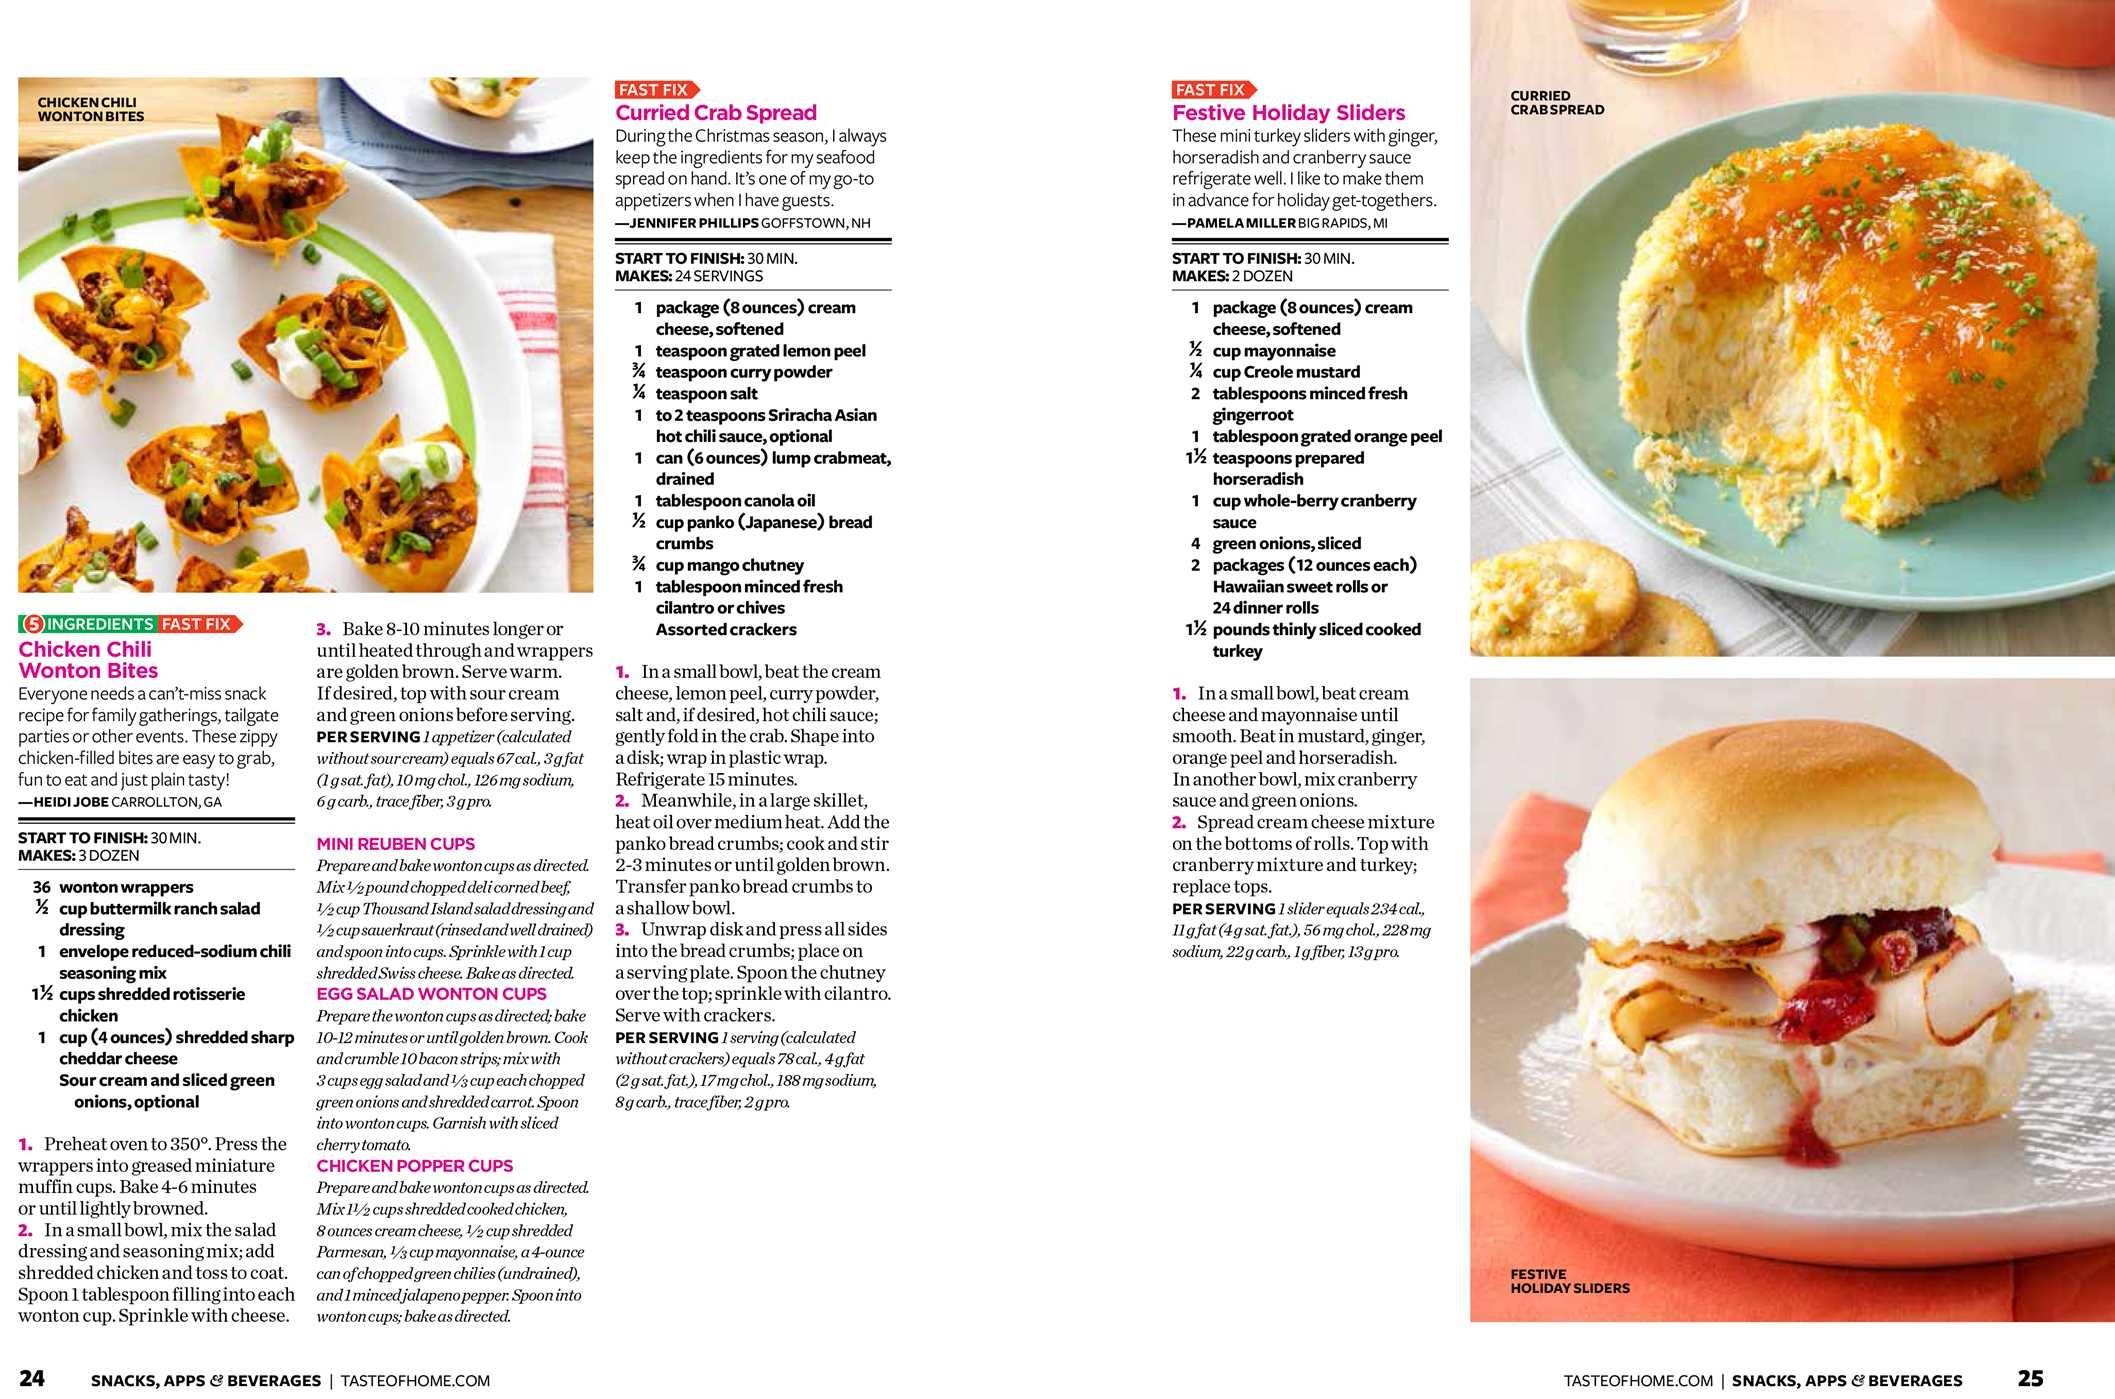 Taste of home simple delicious cookbook book by editors at taste taste of home simple delicious cookbook 978161765550003 forumfinder Gallery